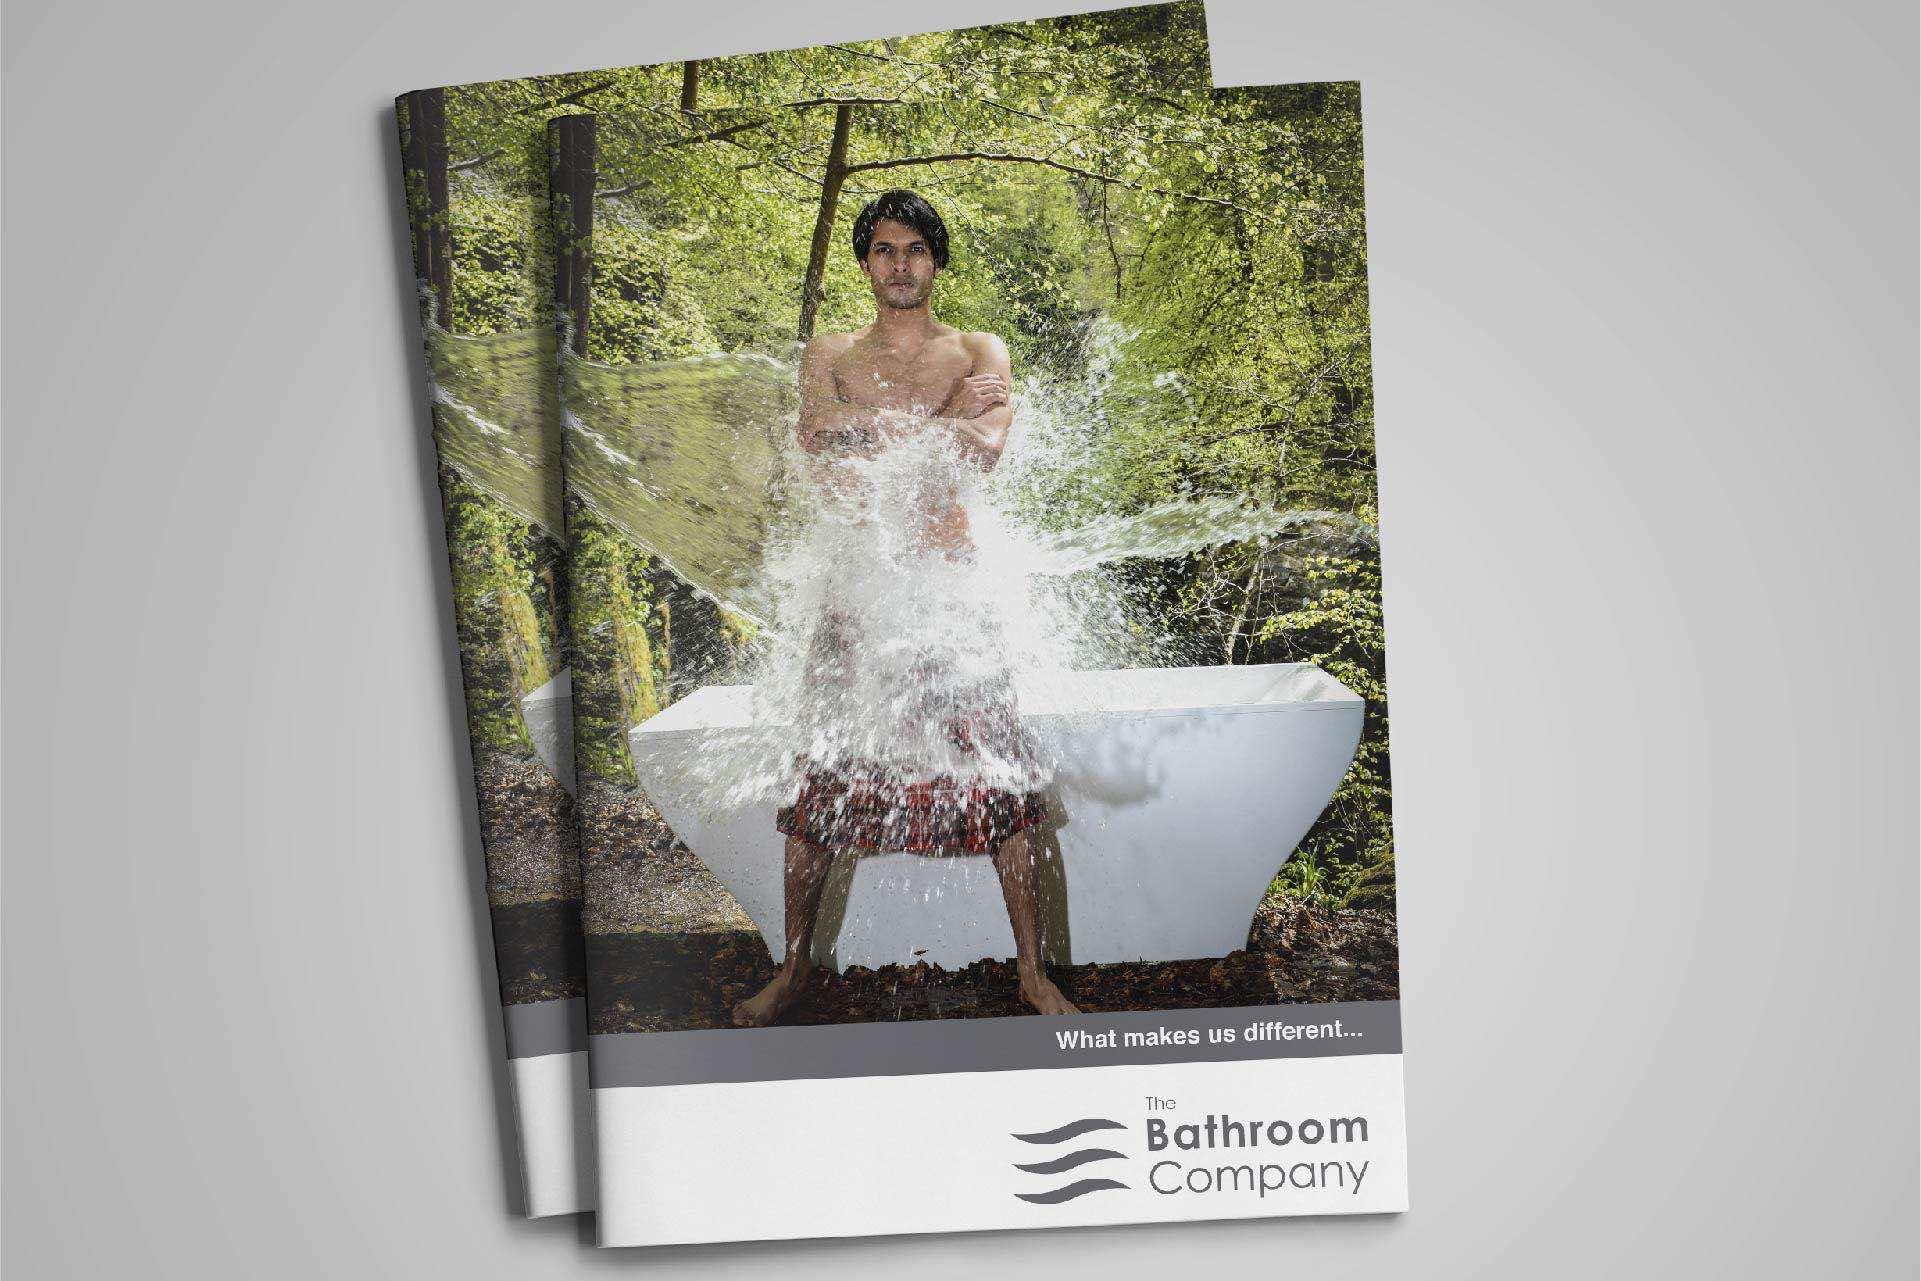 the bathroom company, perth | winter and simpson print